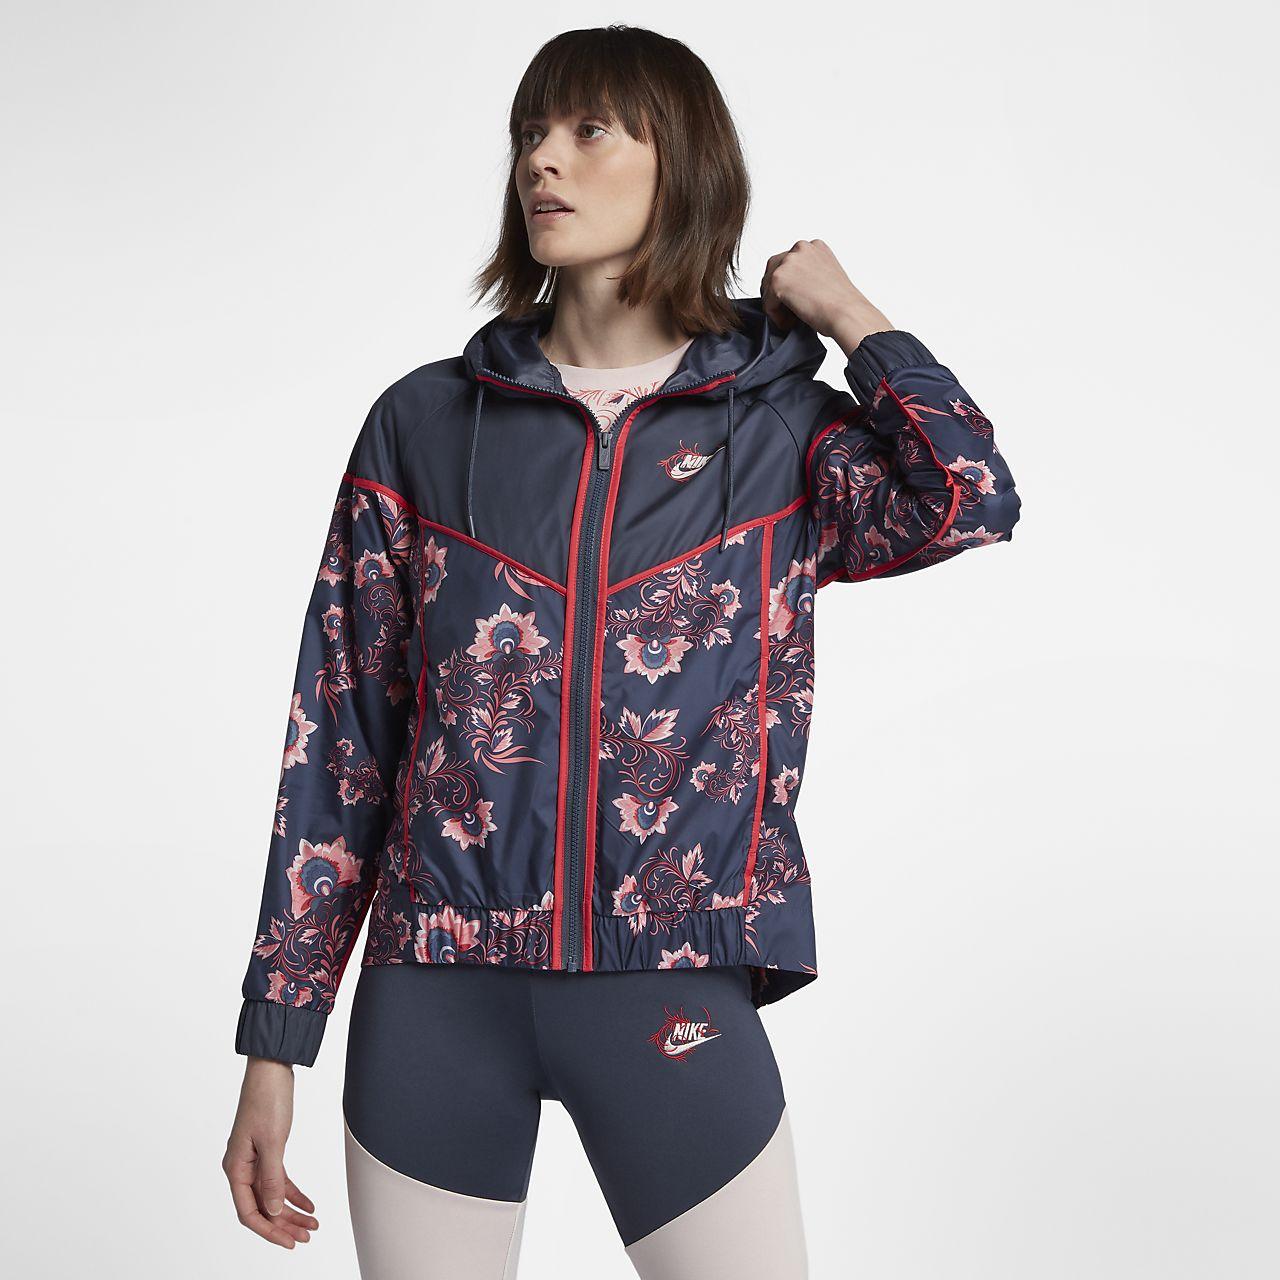 ... Nike Sportswear Windrunner Floral Women's Printed Jacket